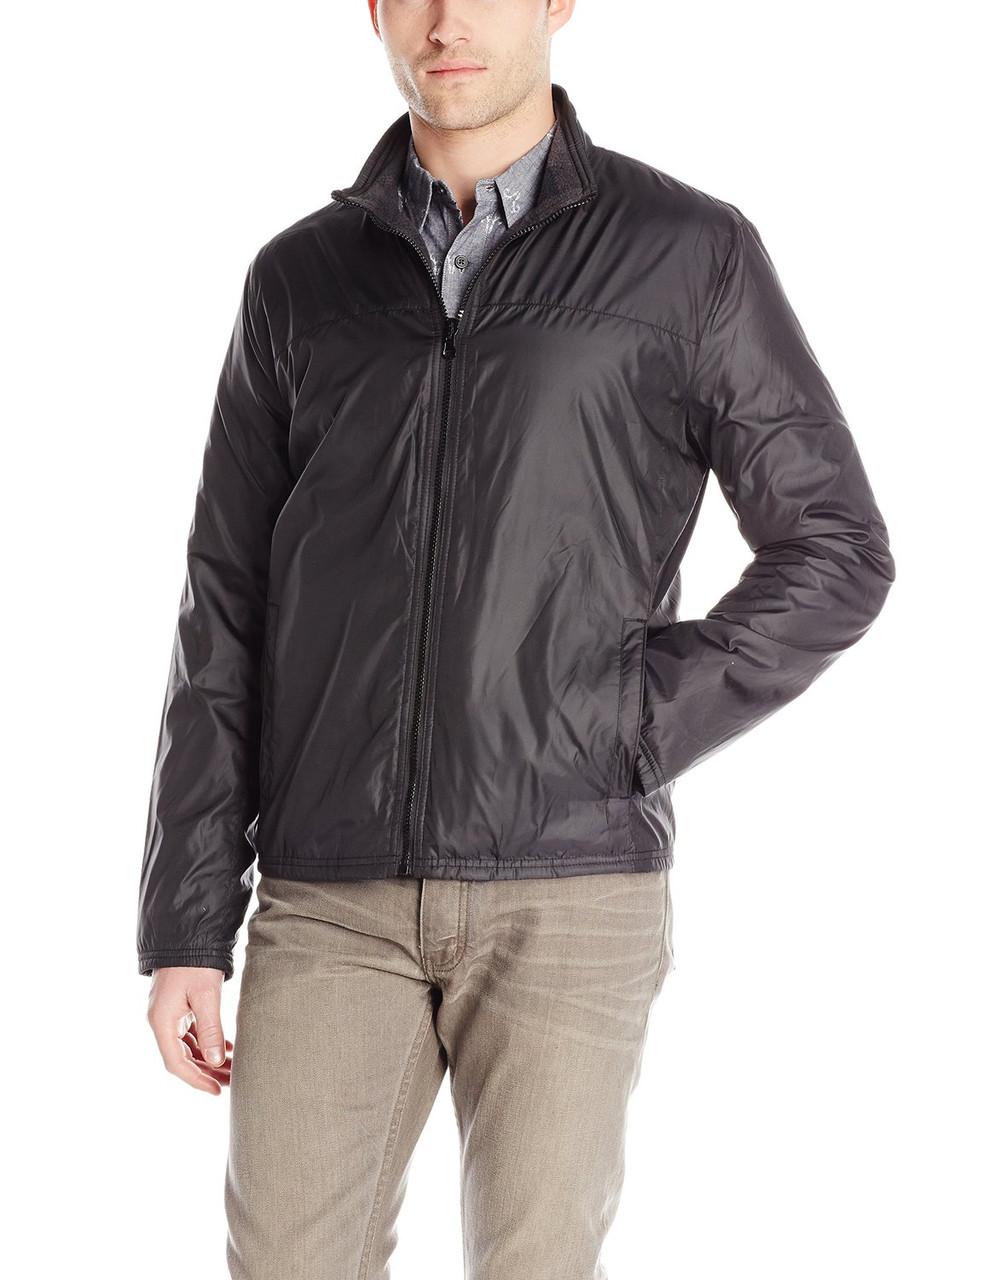 Куртка Kenneth Cole Reaction Reversible, M, Black/Charcoal, 443MP128